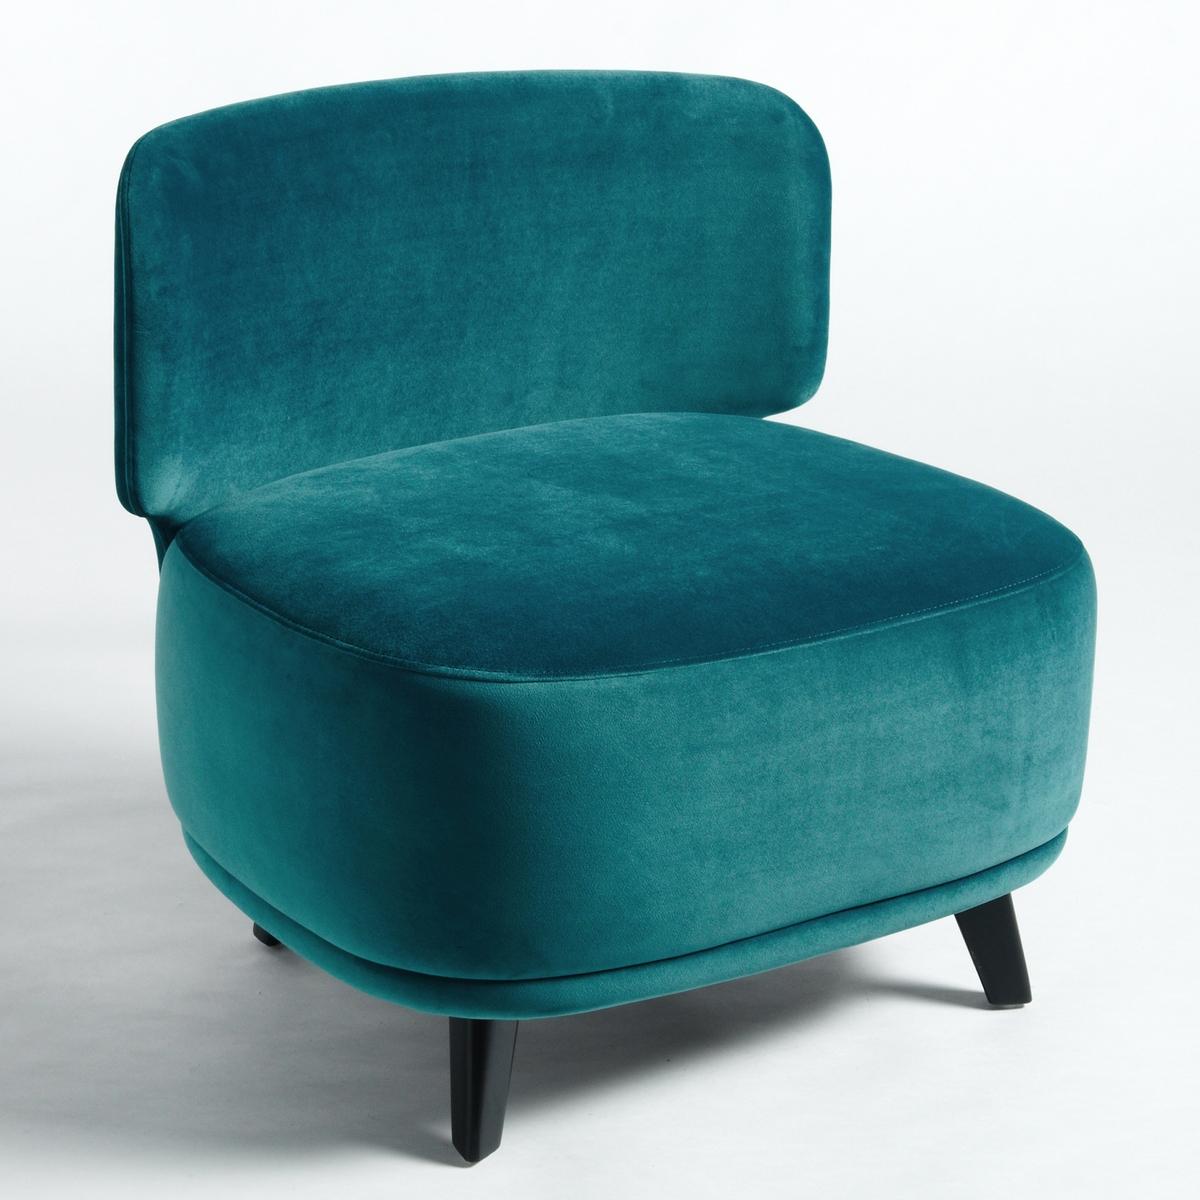 Кресло 1,5-местное Odalie, design E. dynacord dynacord p64